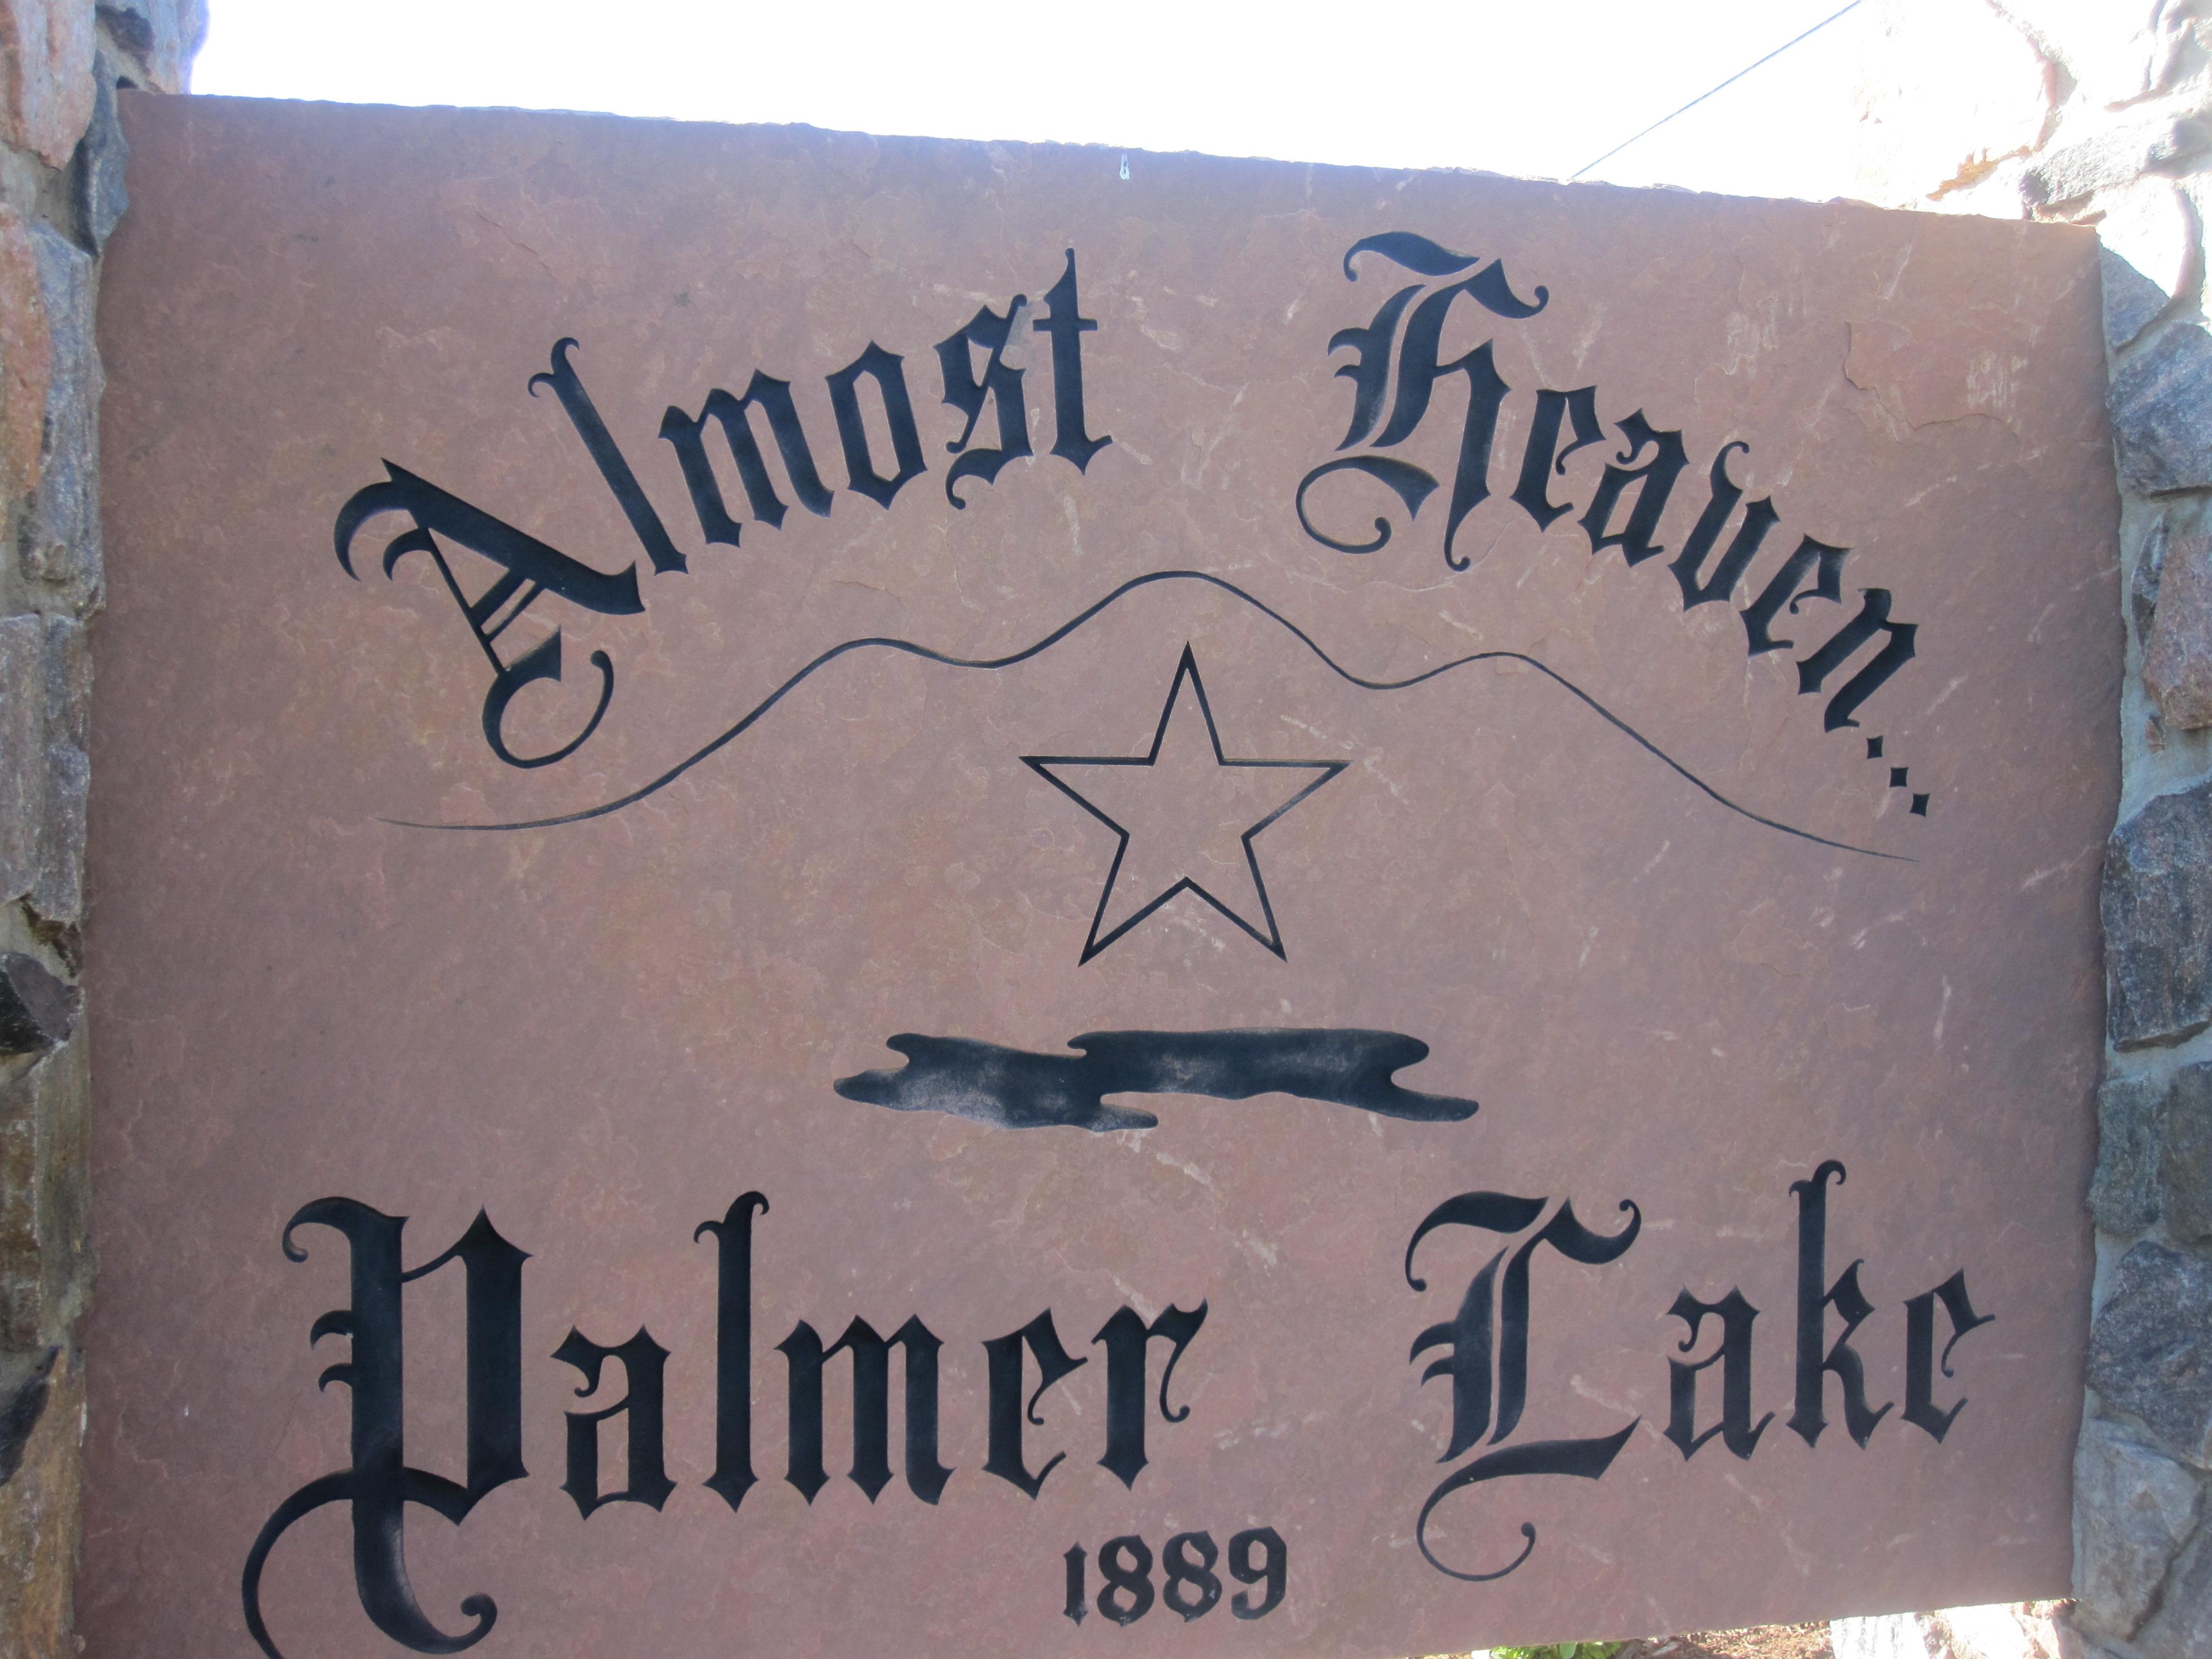 Almost Heaven 2010 file:palmer lake, co, welcome sign img 5174 - wikimedia